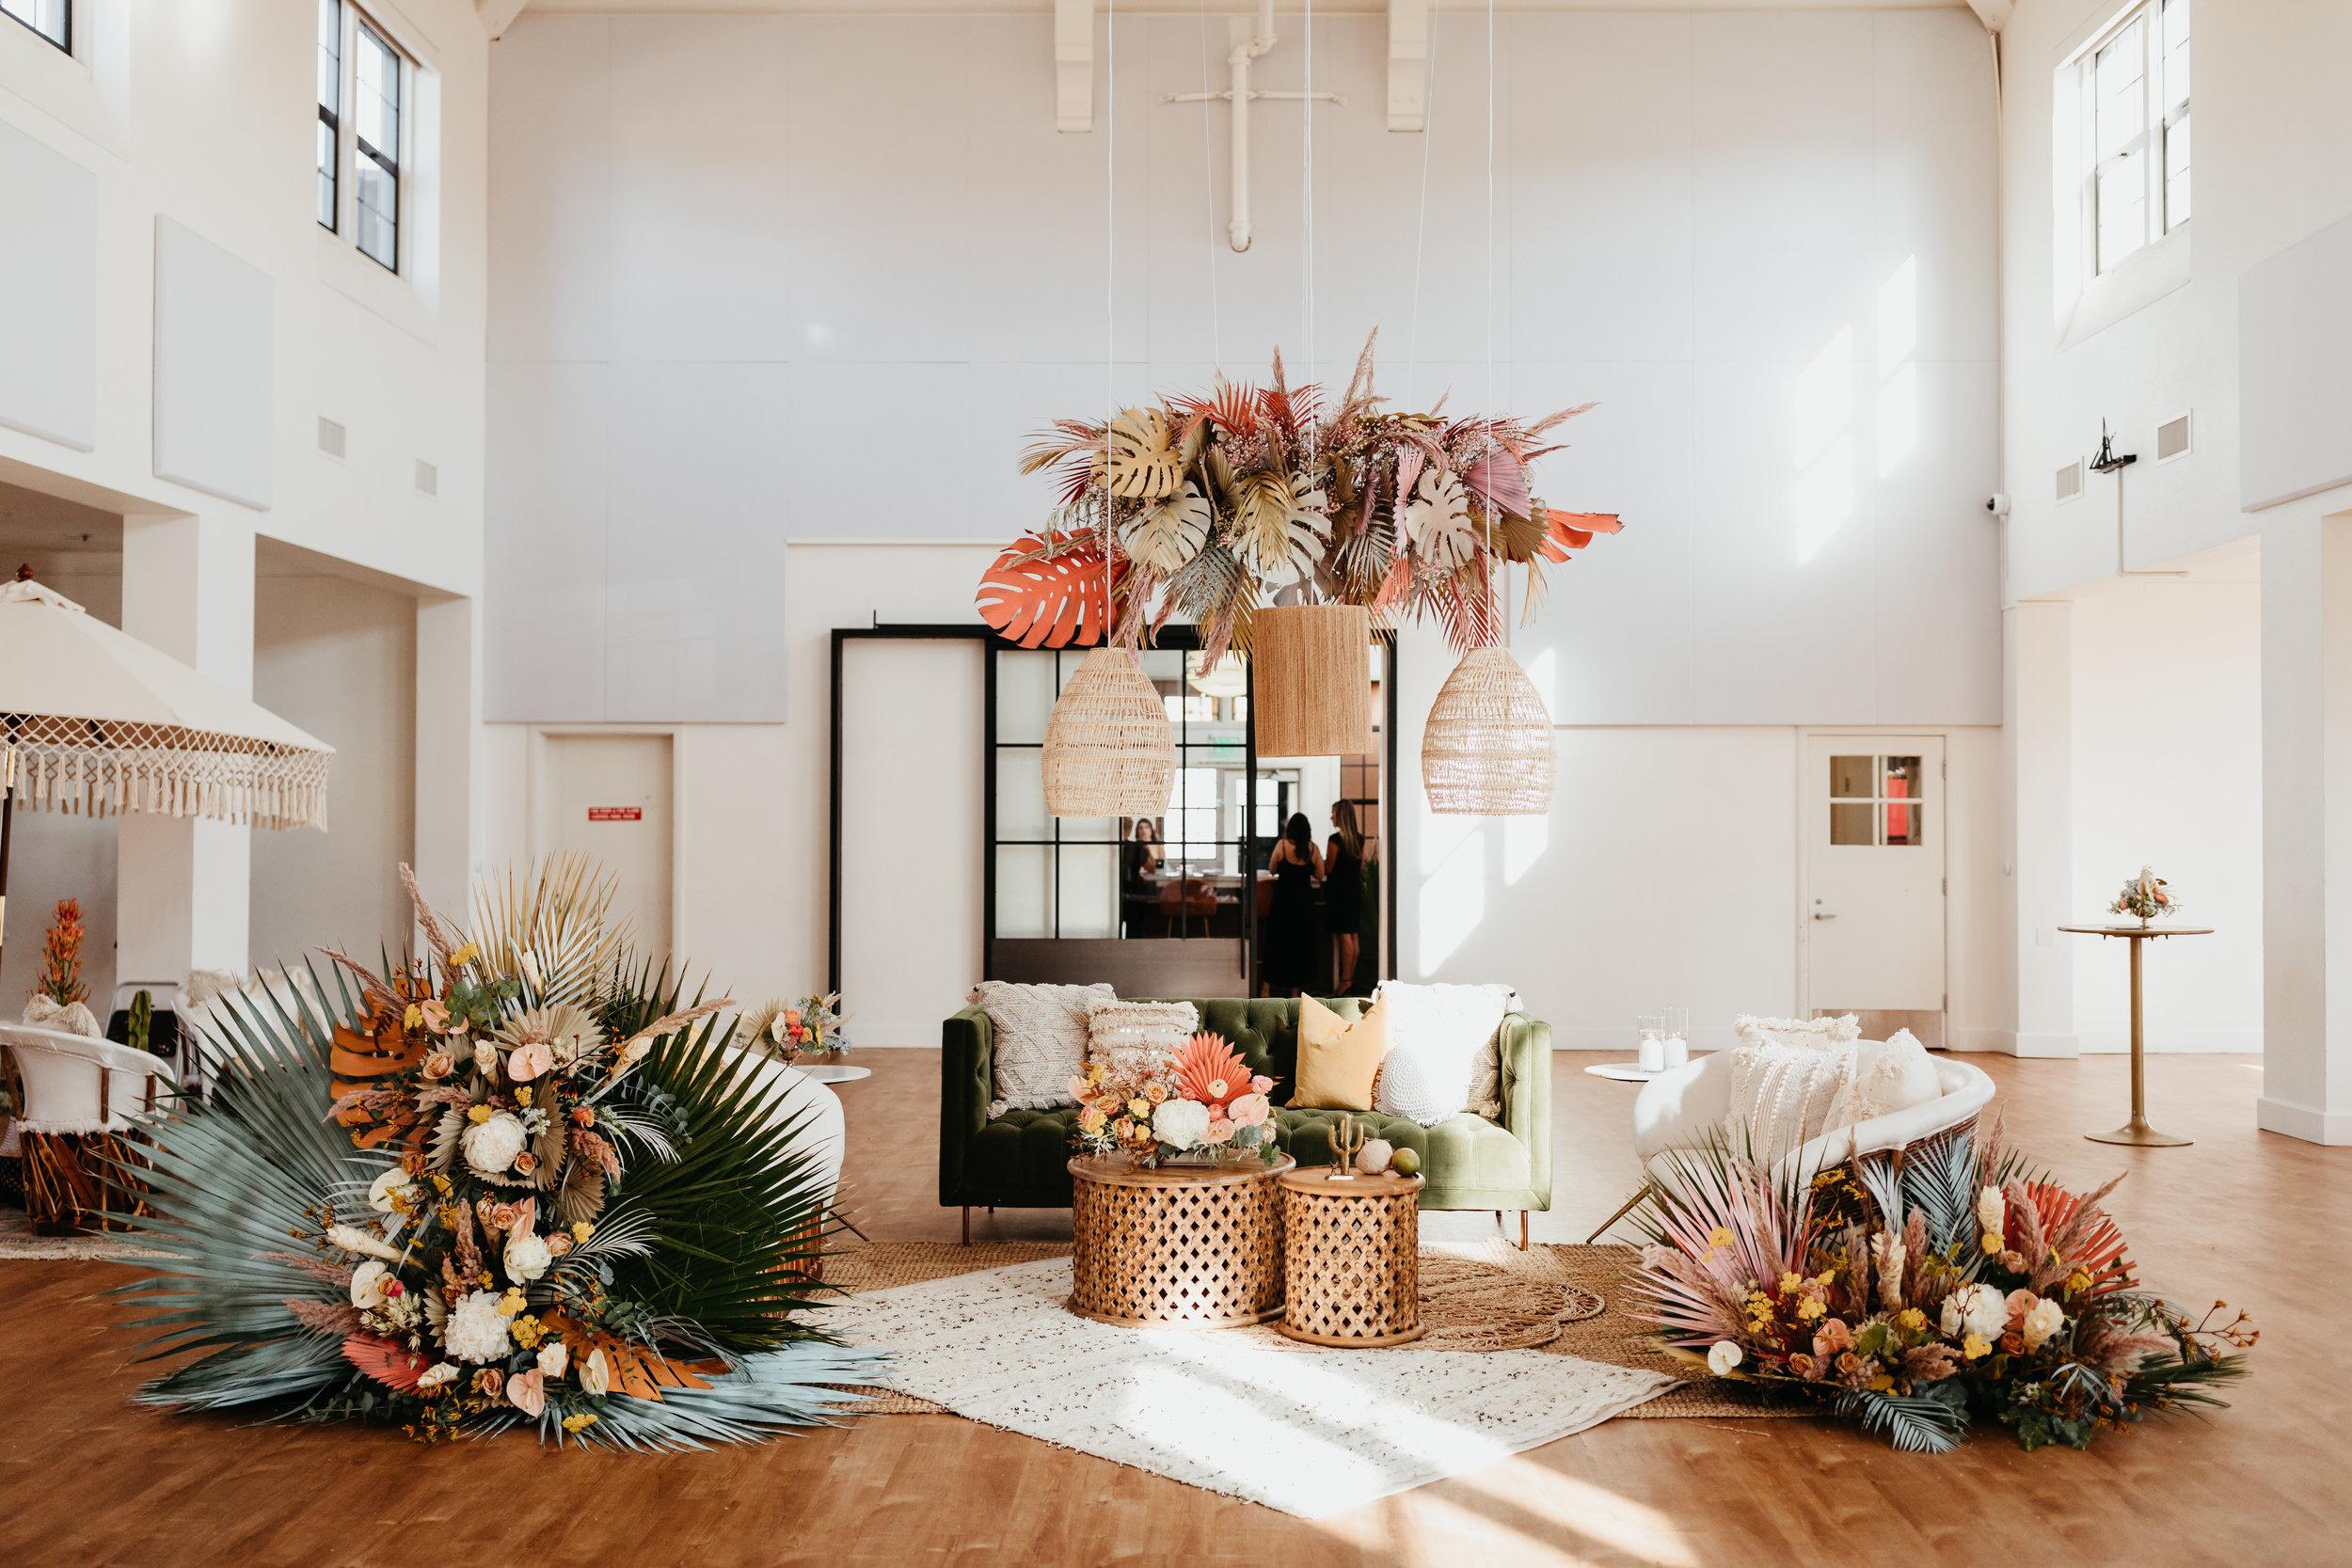 Specialty Rentals:  Sundrop Vintage Rentals  Florals:  Joy of Bloom Florals  Paper Goods:  Double Dipped Calligraphy